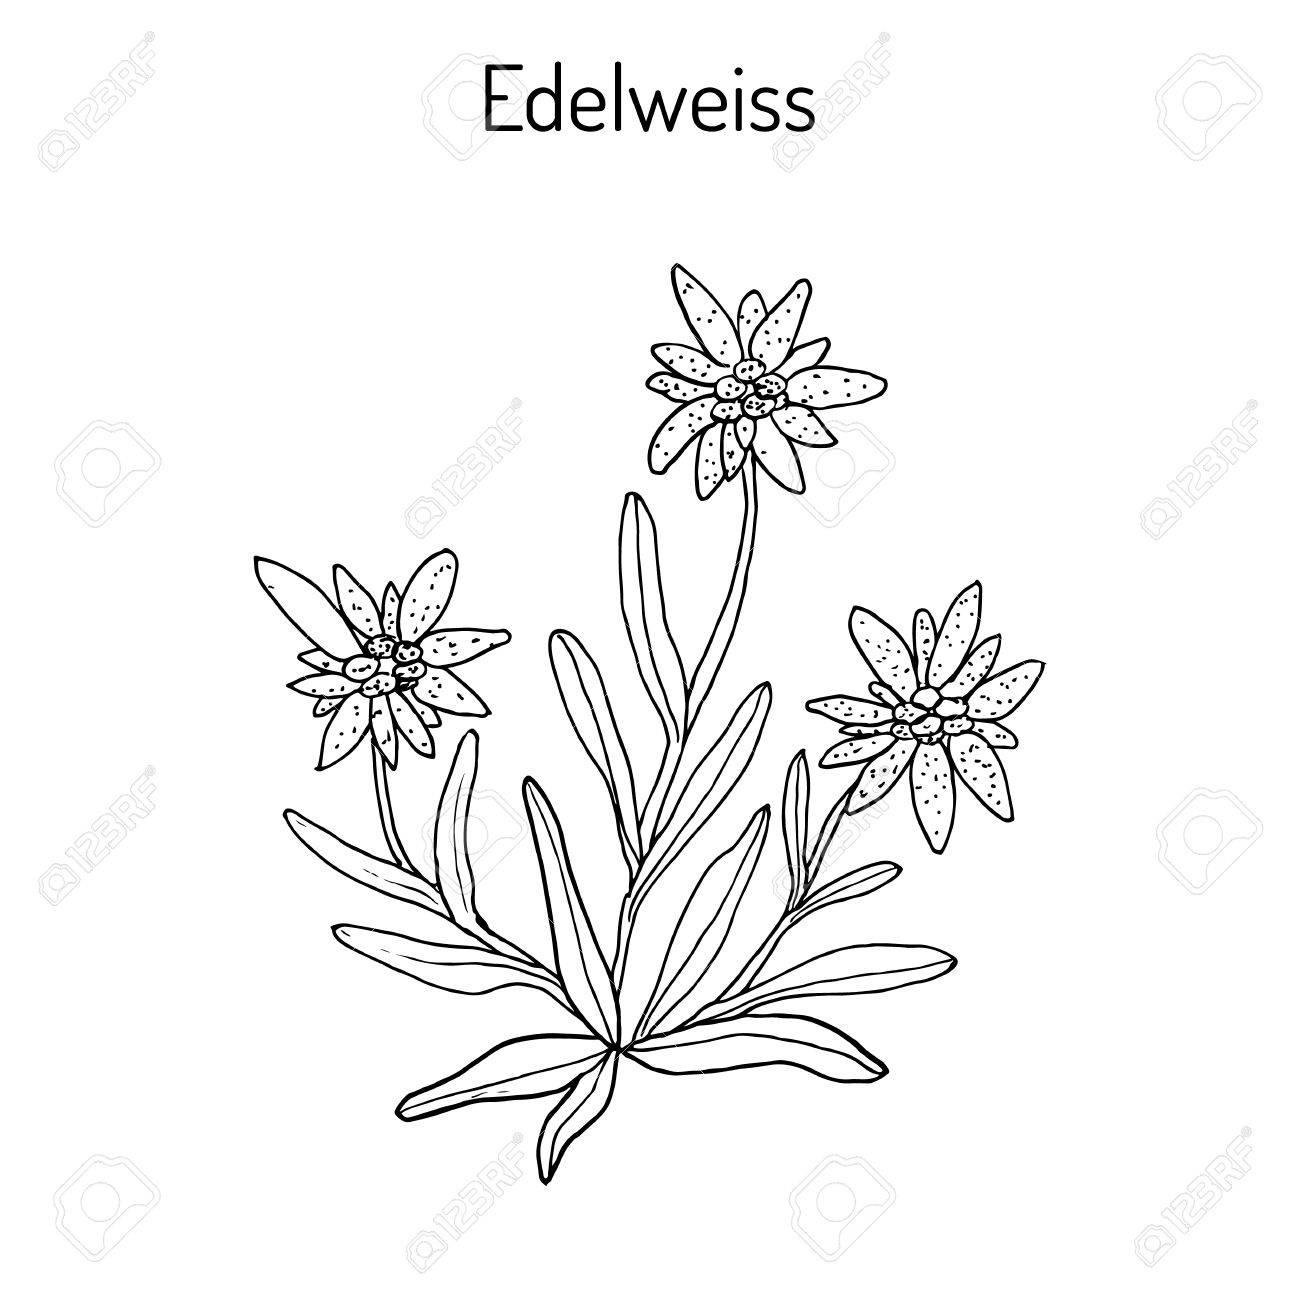 1300x1300 Edelweiss (Leontopodium Alpinum) Flower. Hand Drawn On White